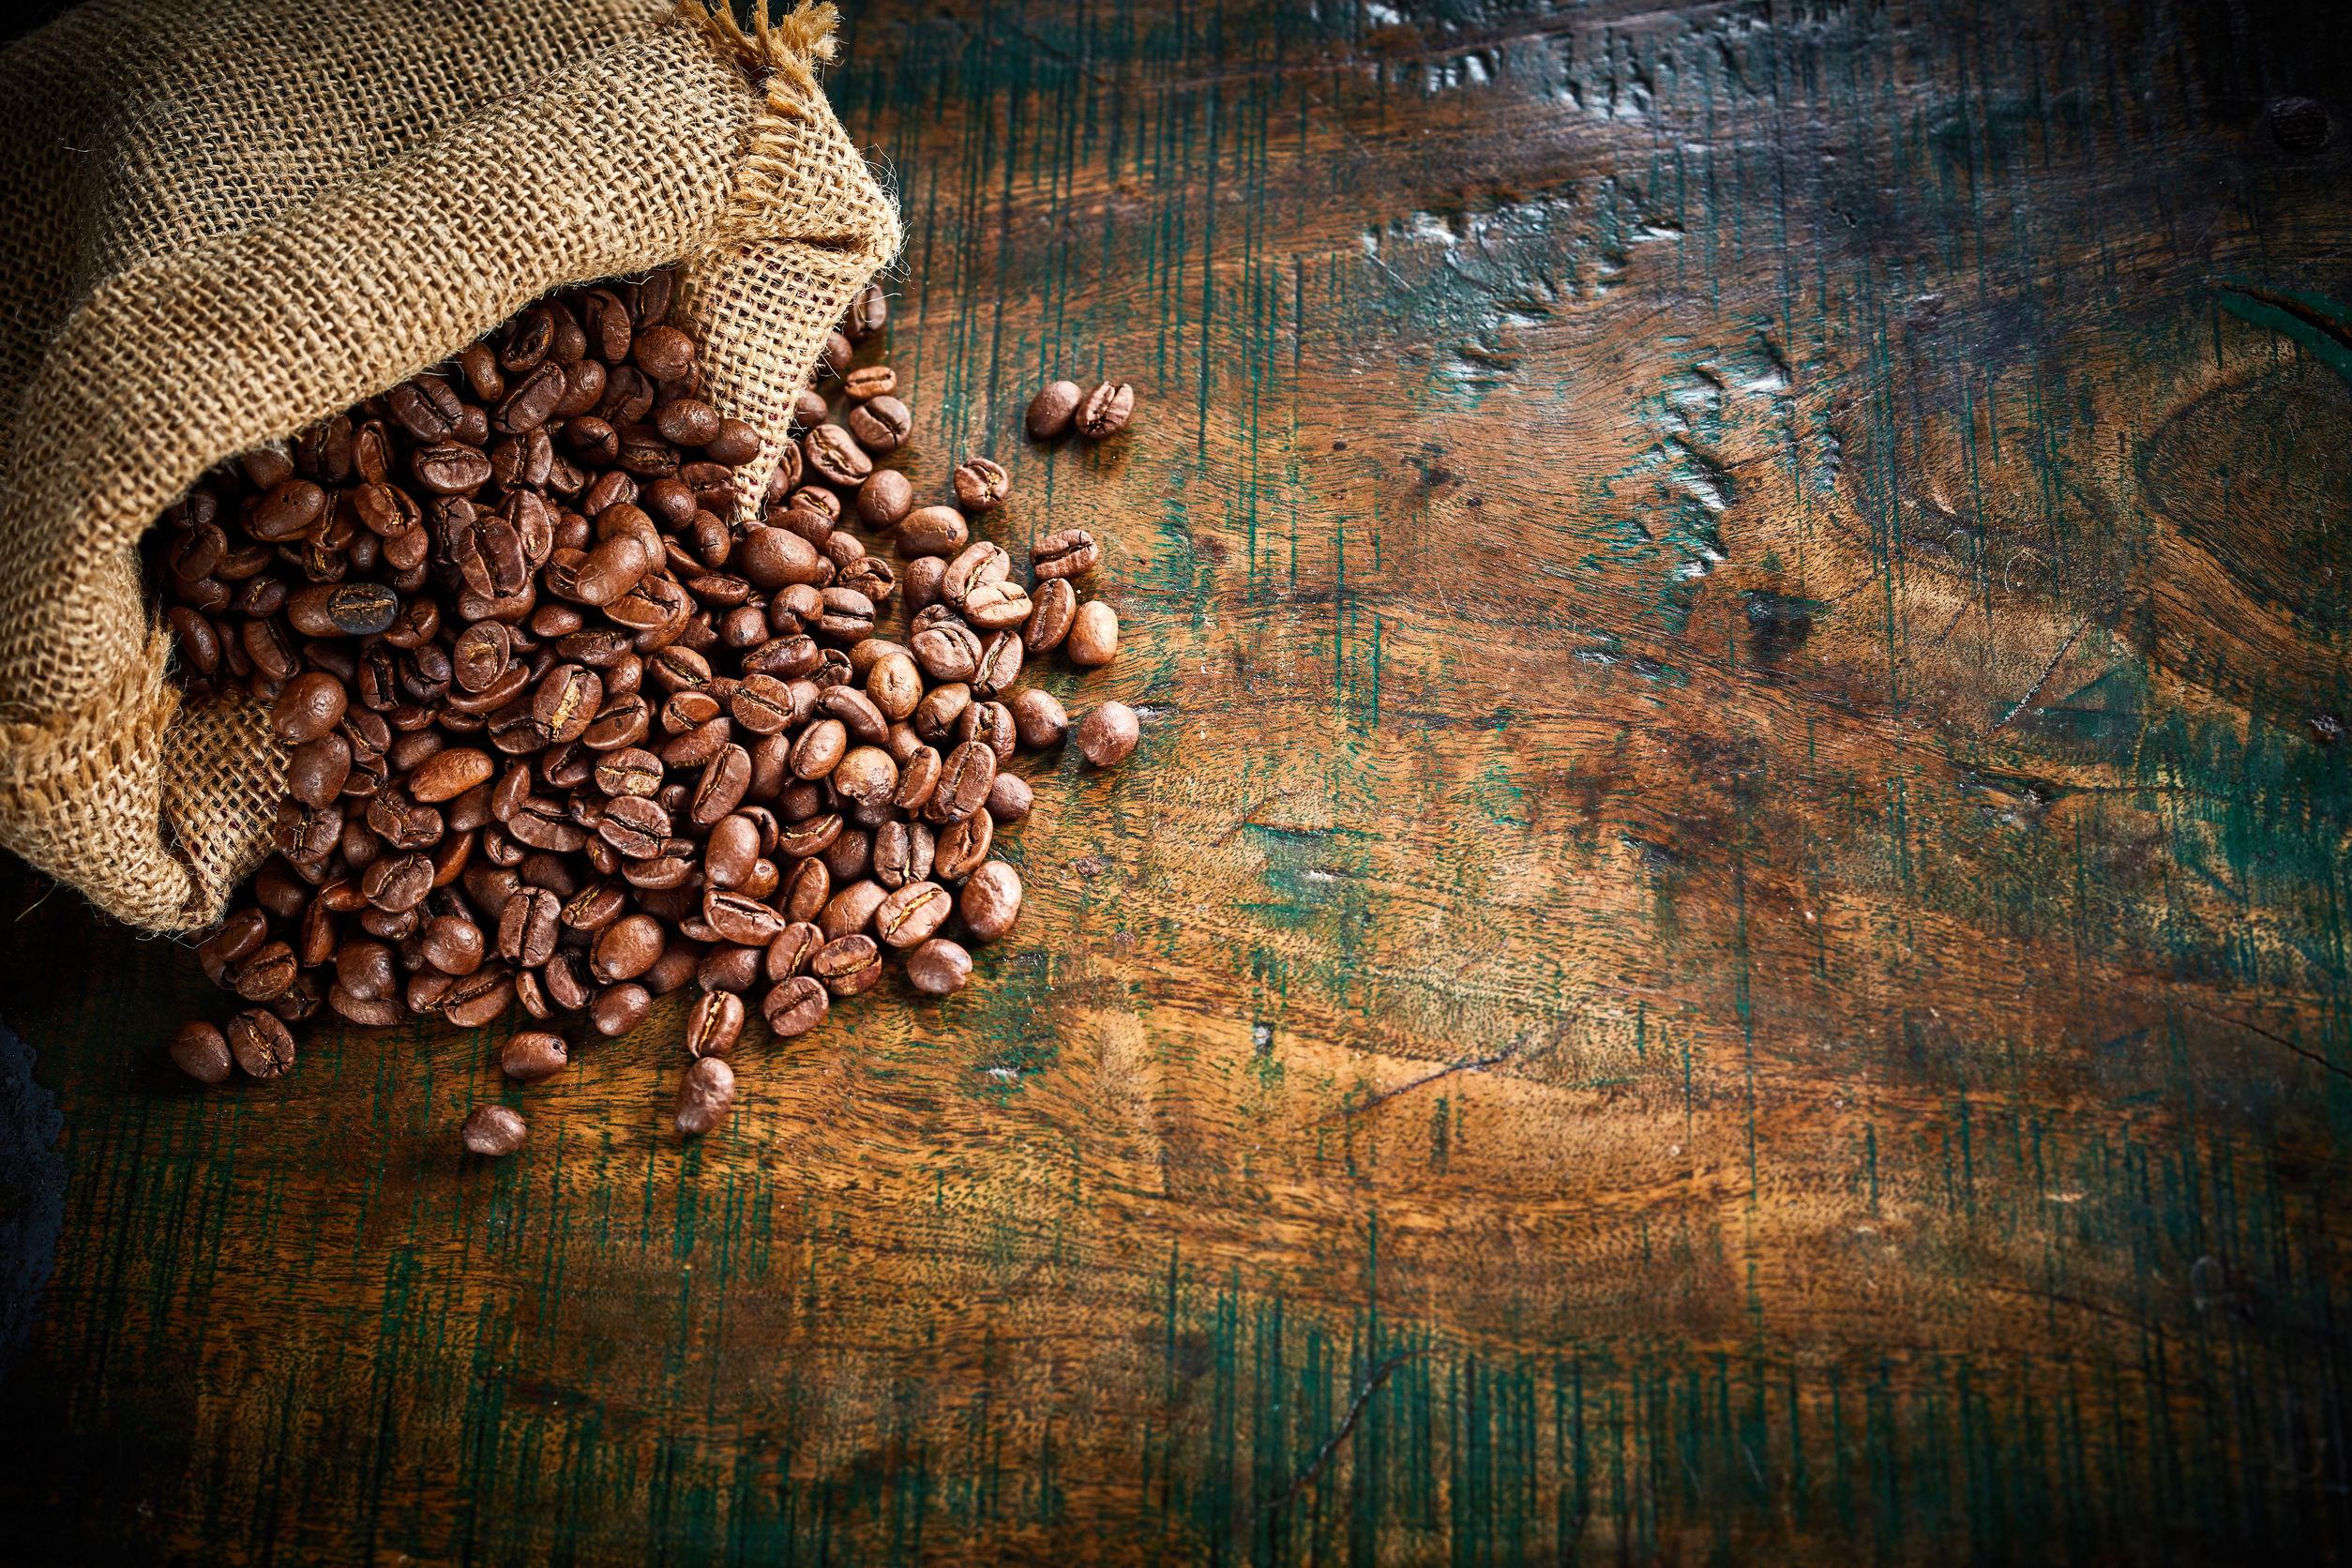 Pequeña bolsa de arpillera de granos de café tostados frescos que se derraman sobre una vieja superficie de madera